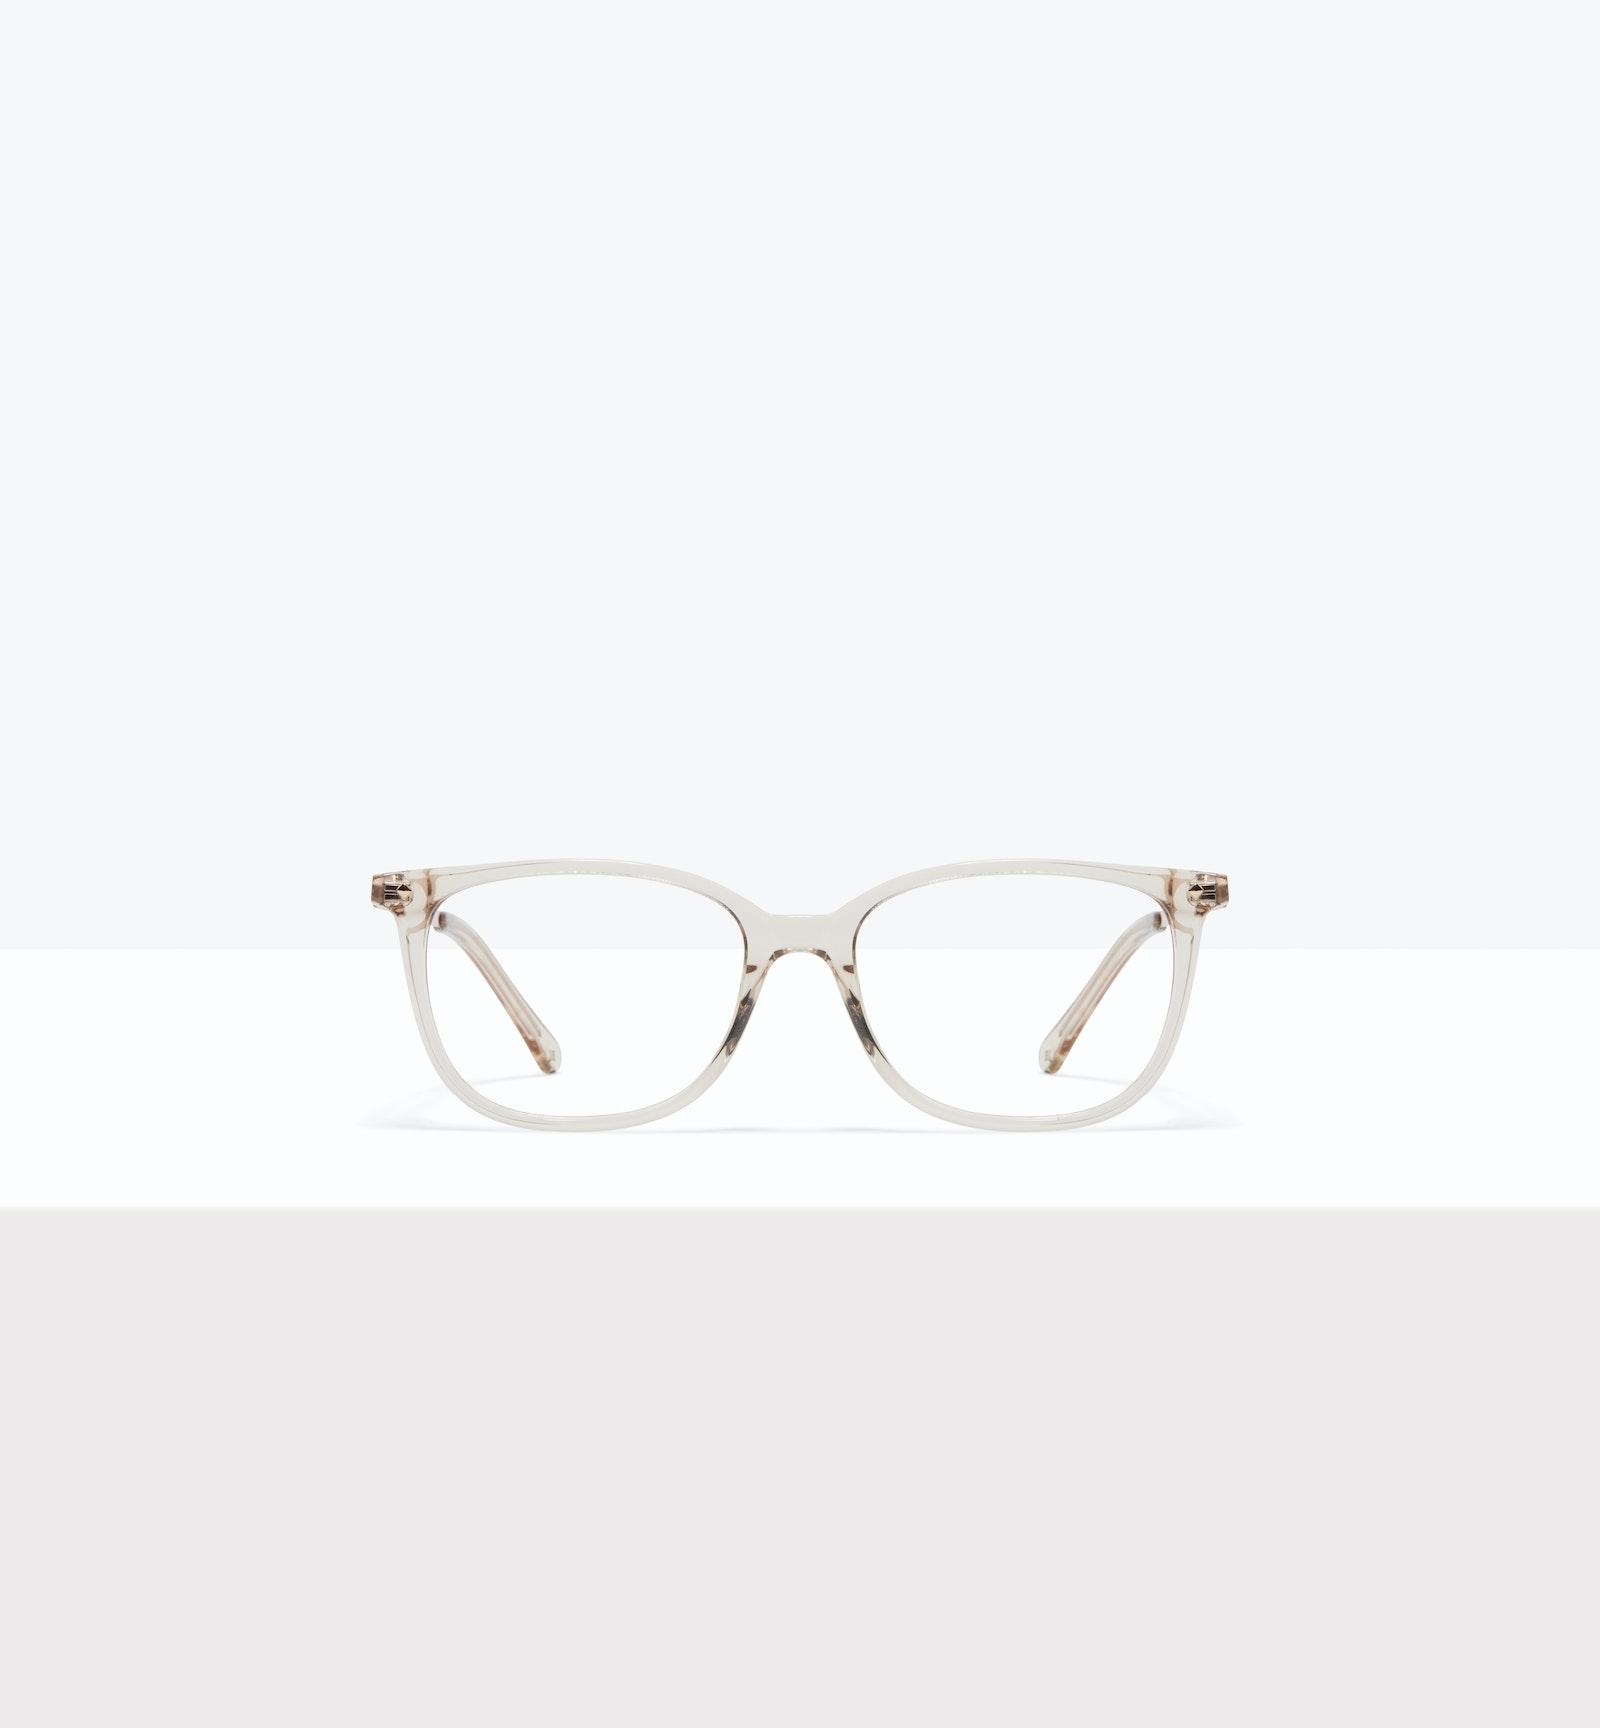 Affordable Fashion Glasses Rectangle Square Eyeglasses Women Refine S Blond